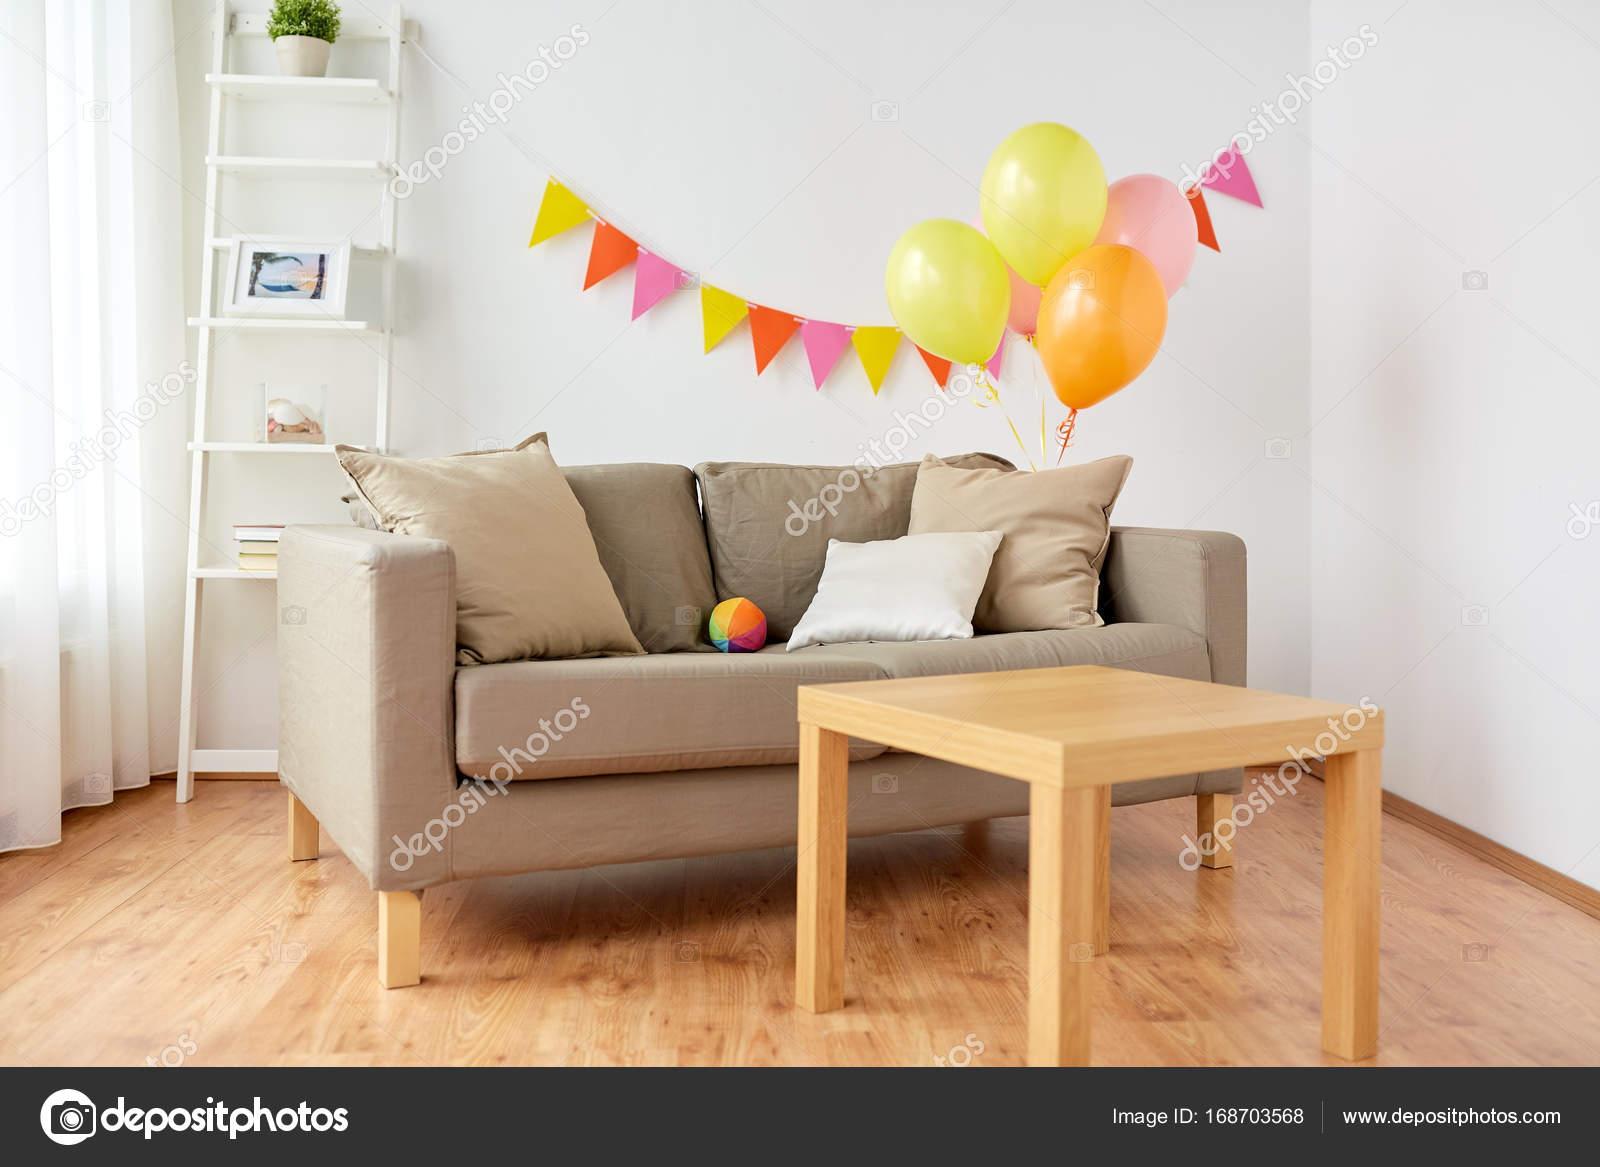 saln decorado para fiesta de cumpleaos casera Foto de stock